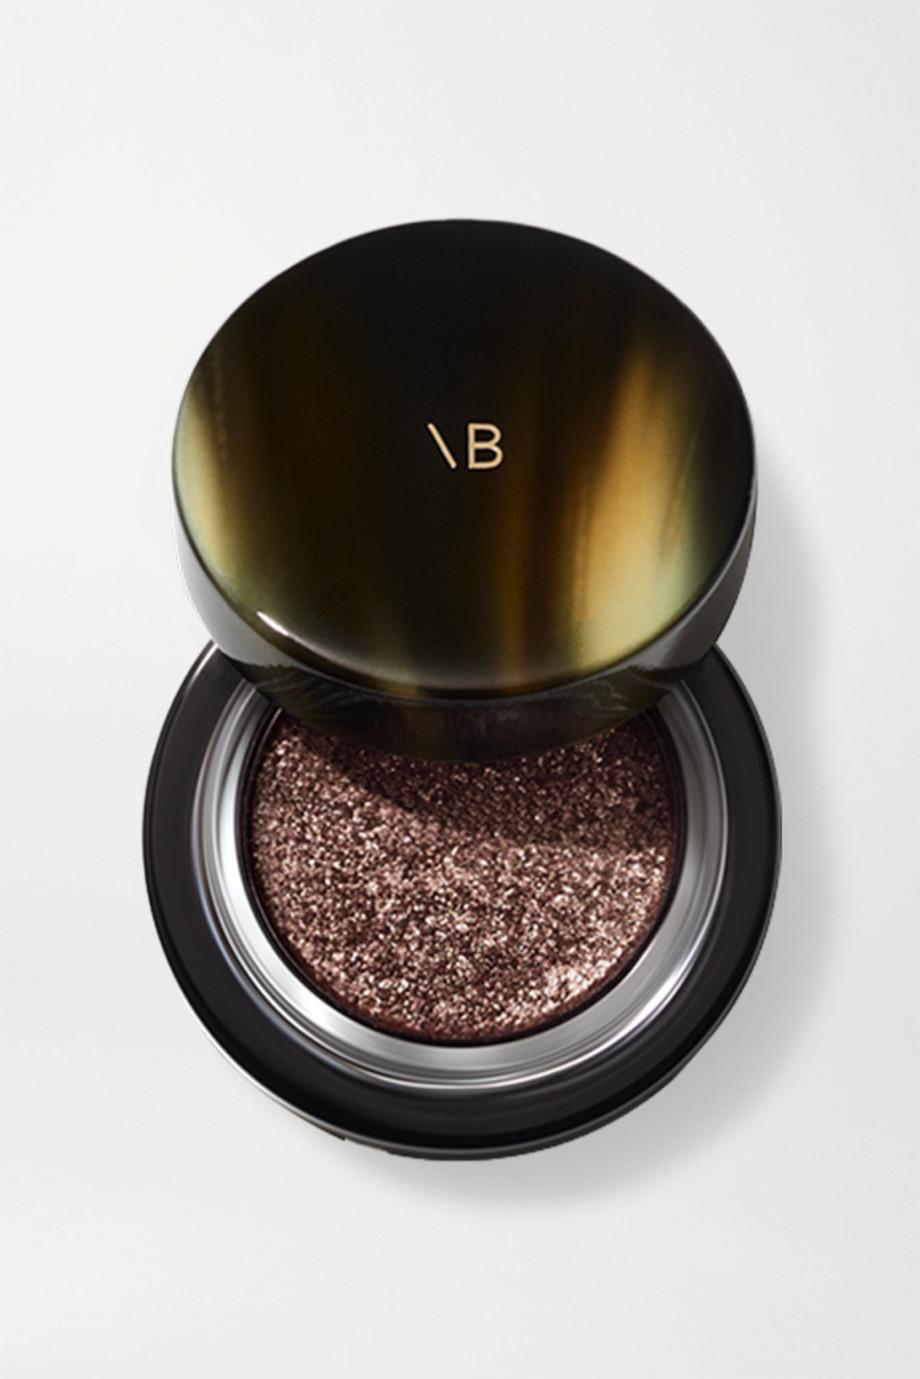 Victoria Beckham Beauty Lid Lustre - Mink